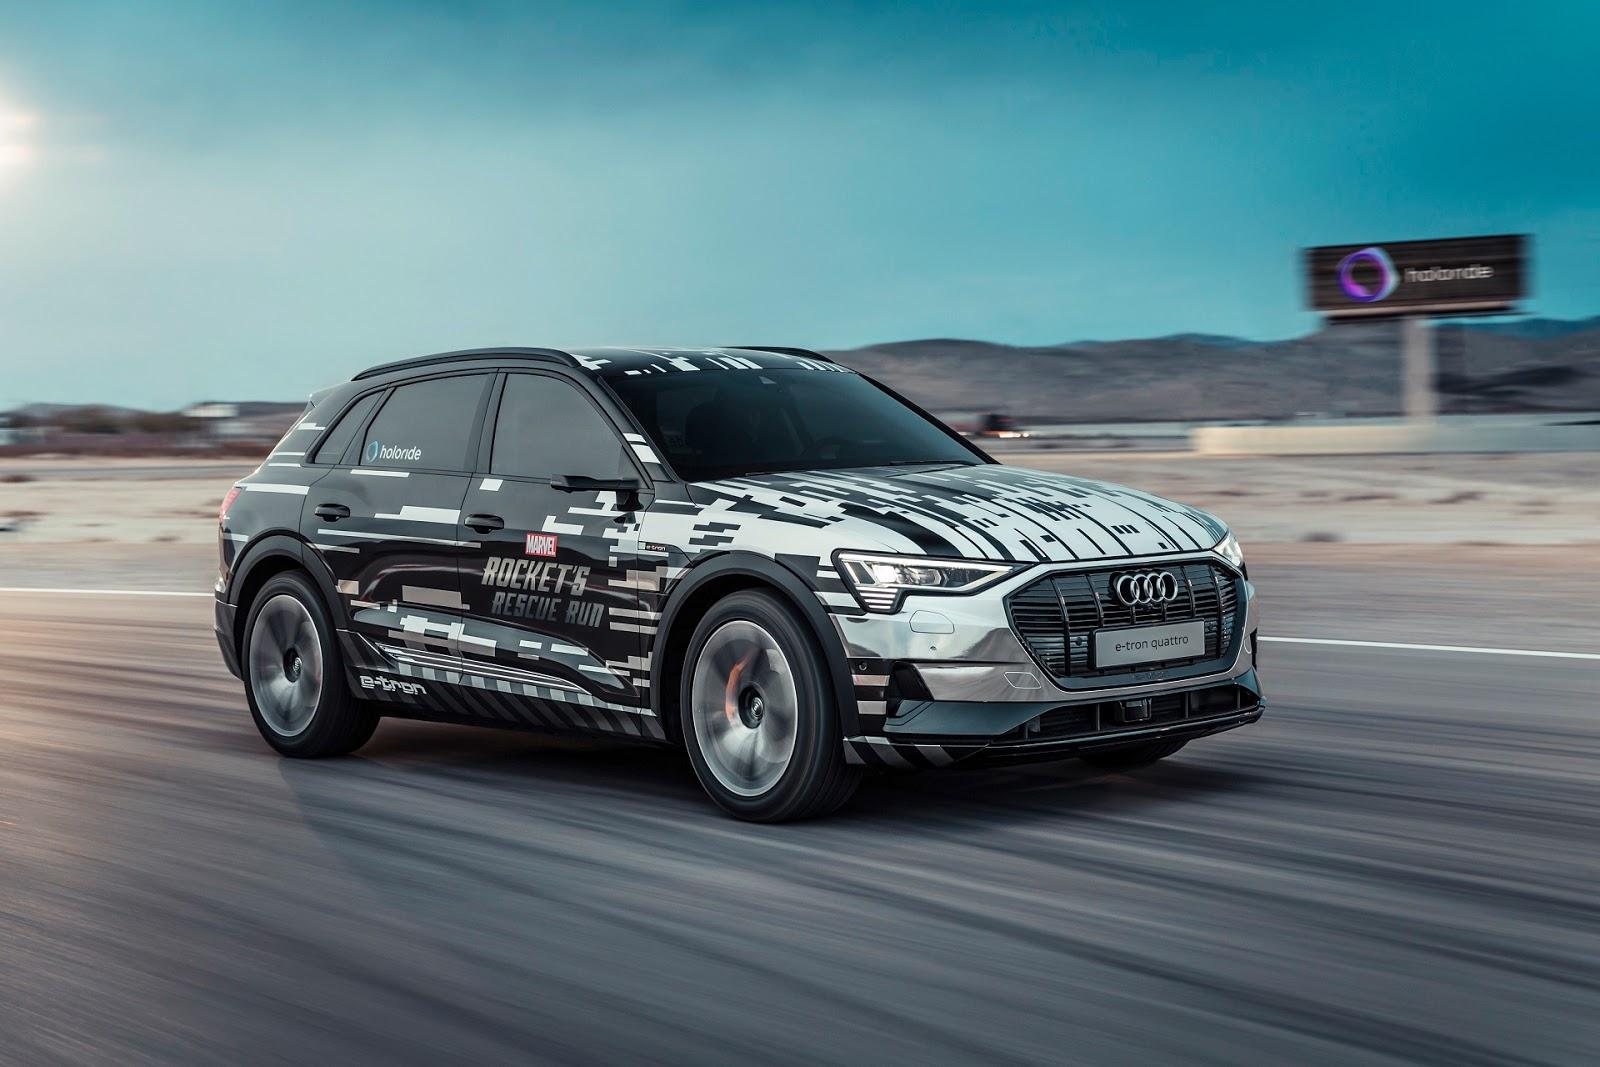 H2BAUDI2B25CE25A325CE25A425CE25972BCES 4 H Audi εξελίσσει VR videogames για το αυτοκίνητο! Audi, Electric cars, video, videos, βίντεο, Τεχνολογία